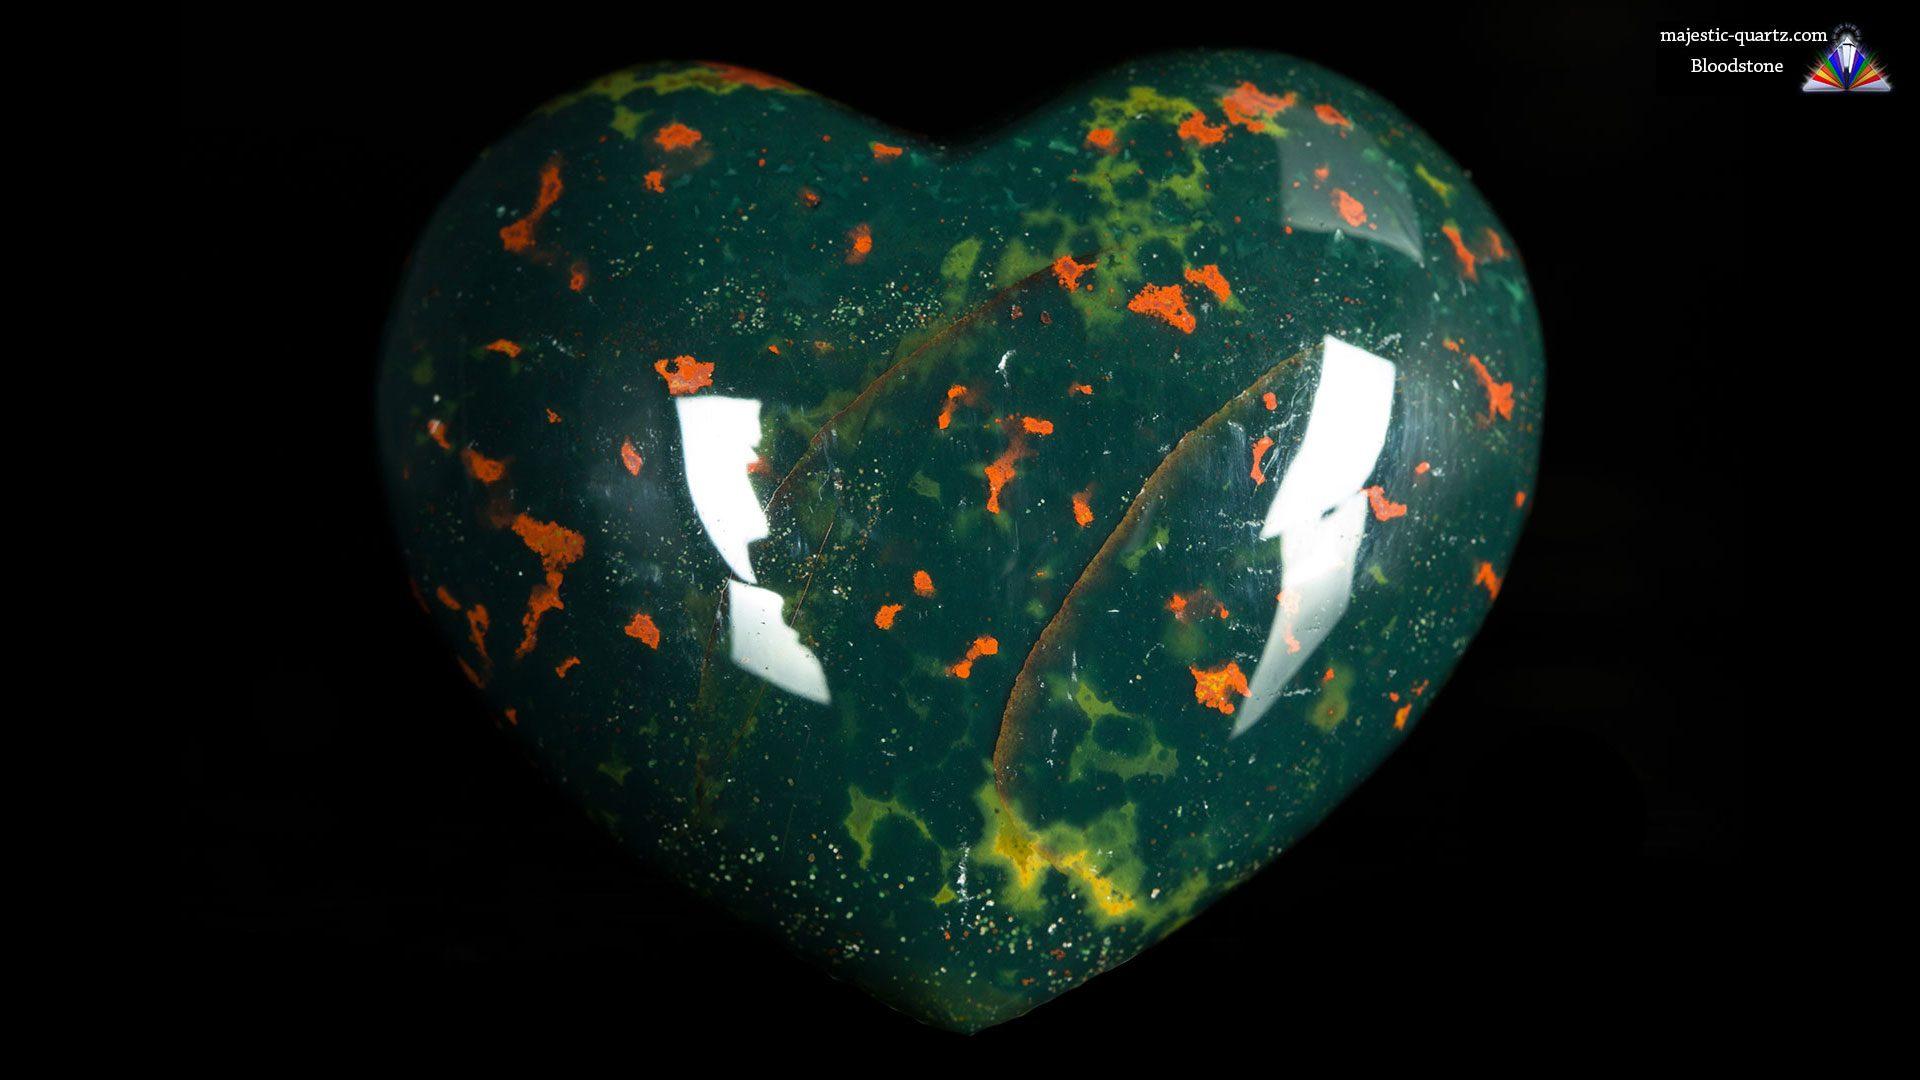 Bloodstone Heart - Photograph by Anthony Bradford